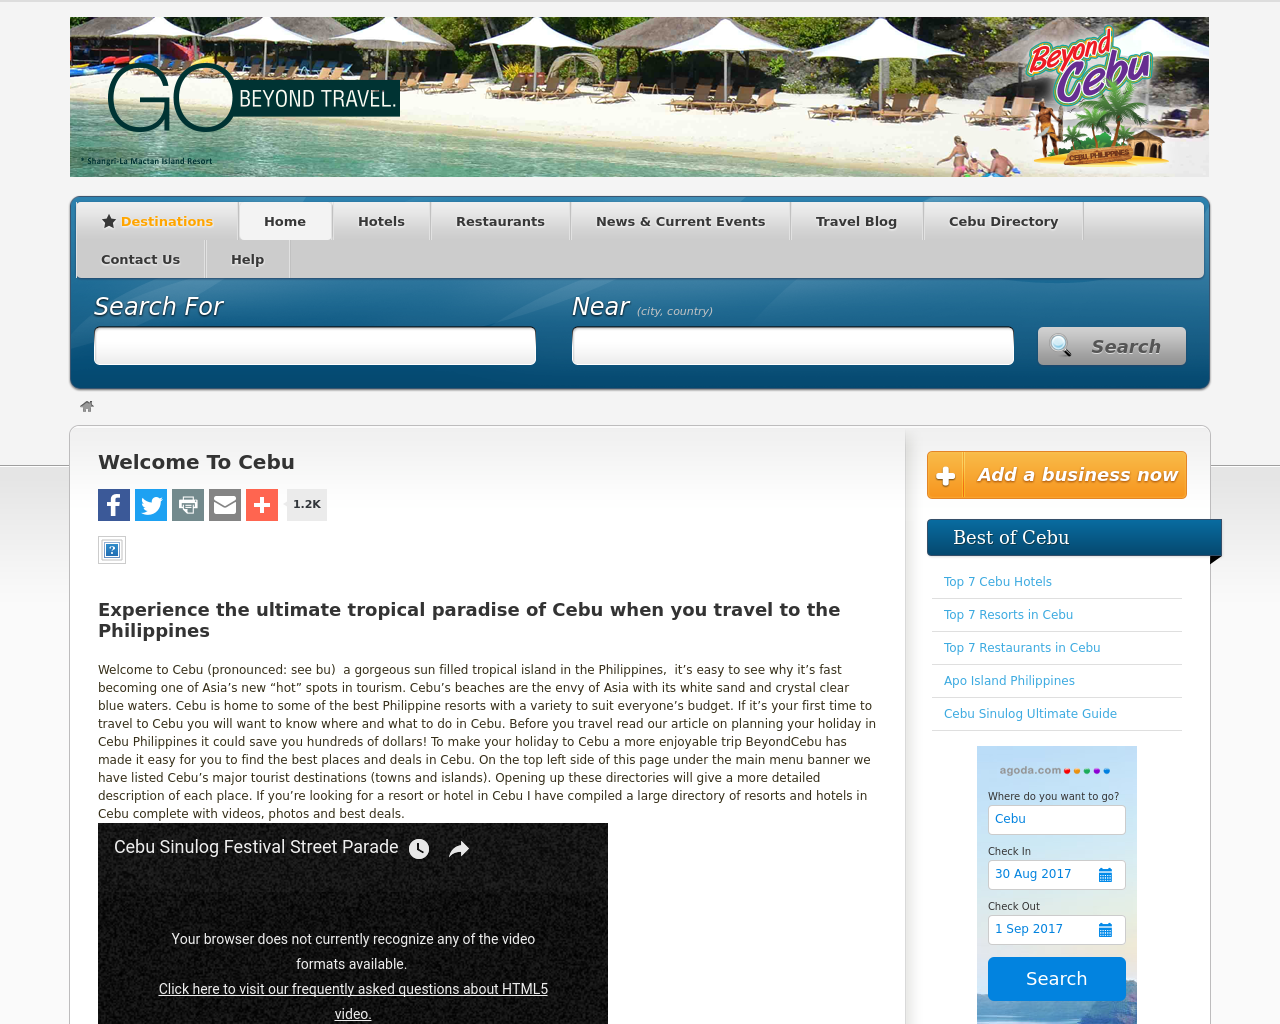 Beyond-Cebu-Advertising-Reviews-Pricing